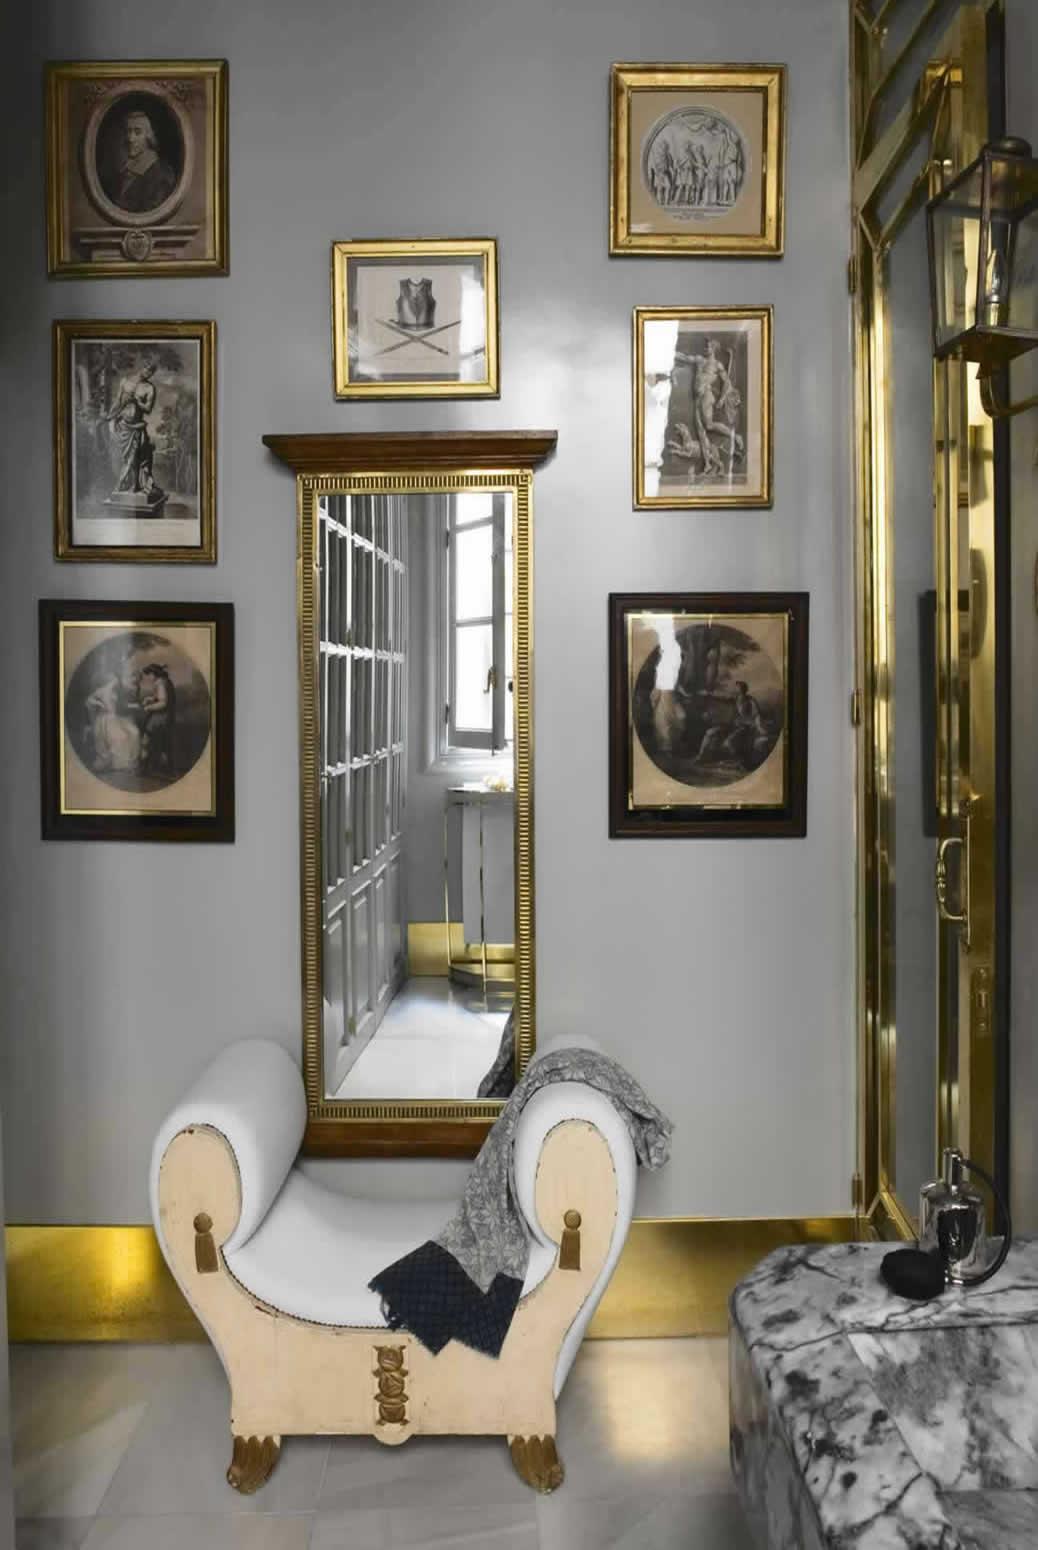 http://1.bp.blogspot.com/-OK0tKmw0aHk/T05GuMJ0L4I/AAAAAAAAoew/F8Y7k4aI4qA/s1600/lorenzo+castillo+showroom+habituallychic+015.jpg